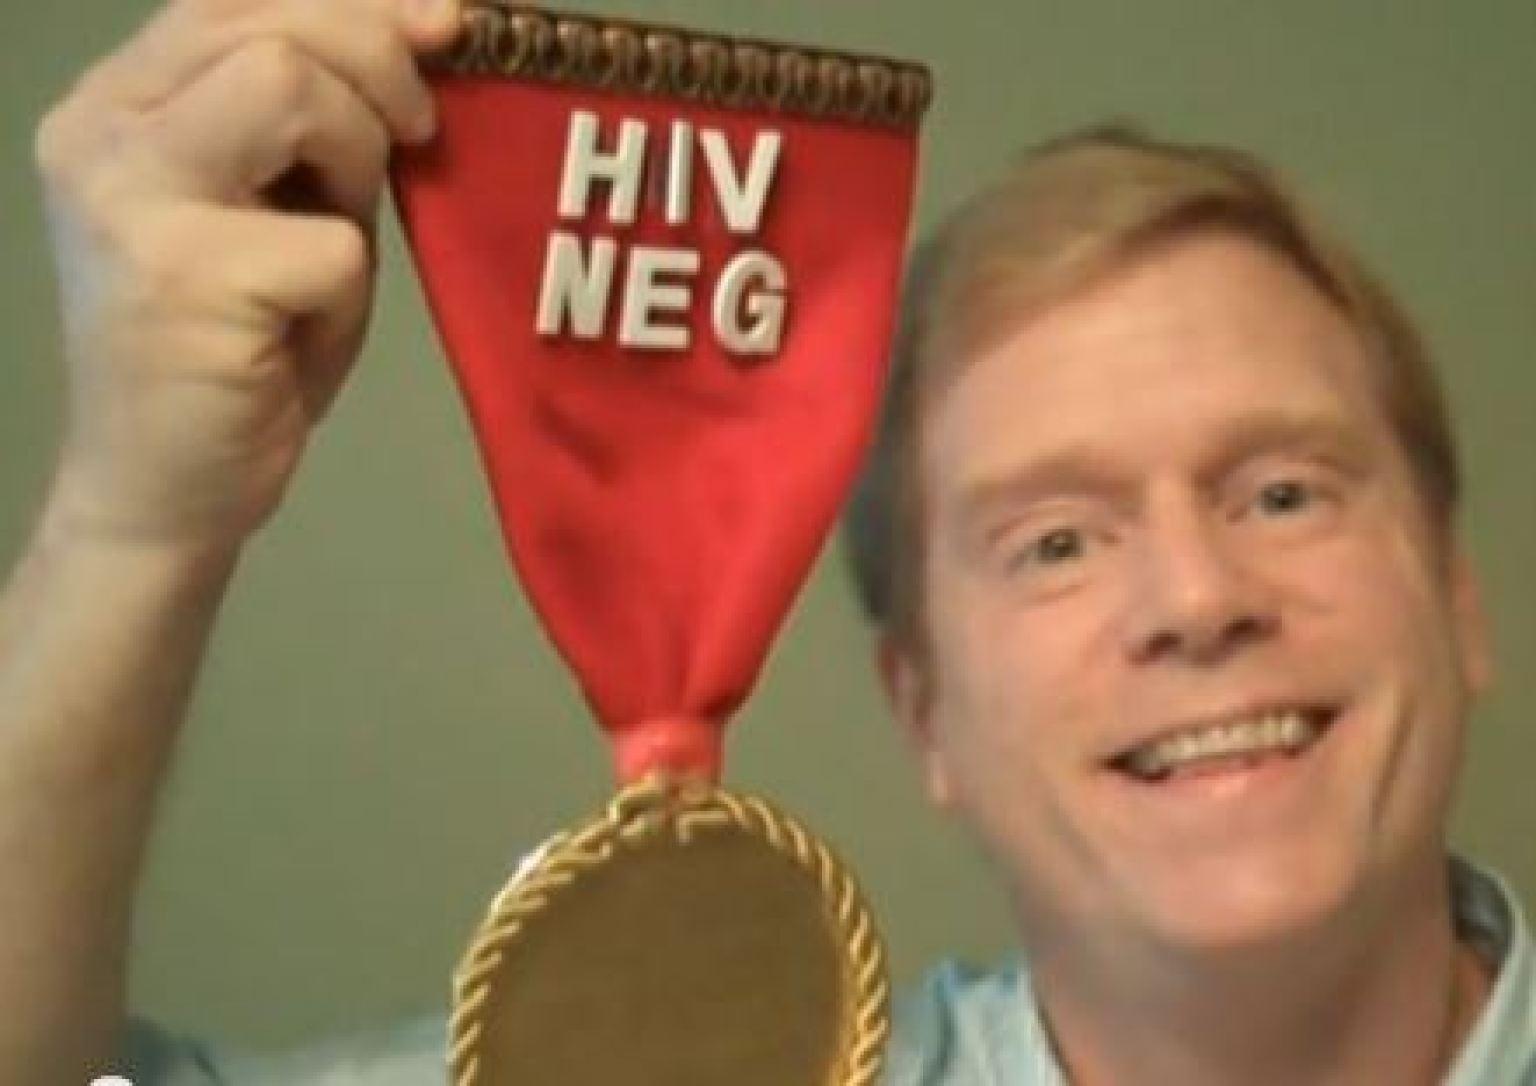 Hiv negative dating hiv positive gay